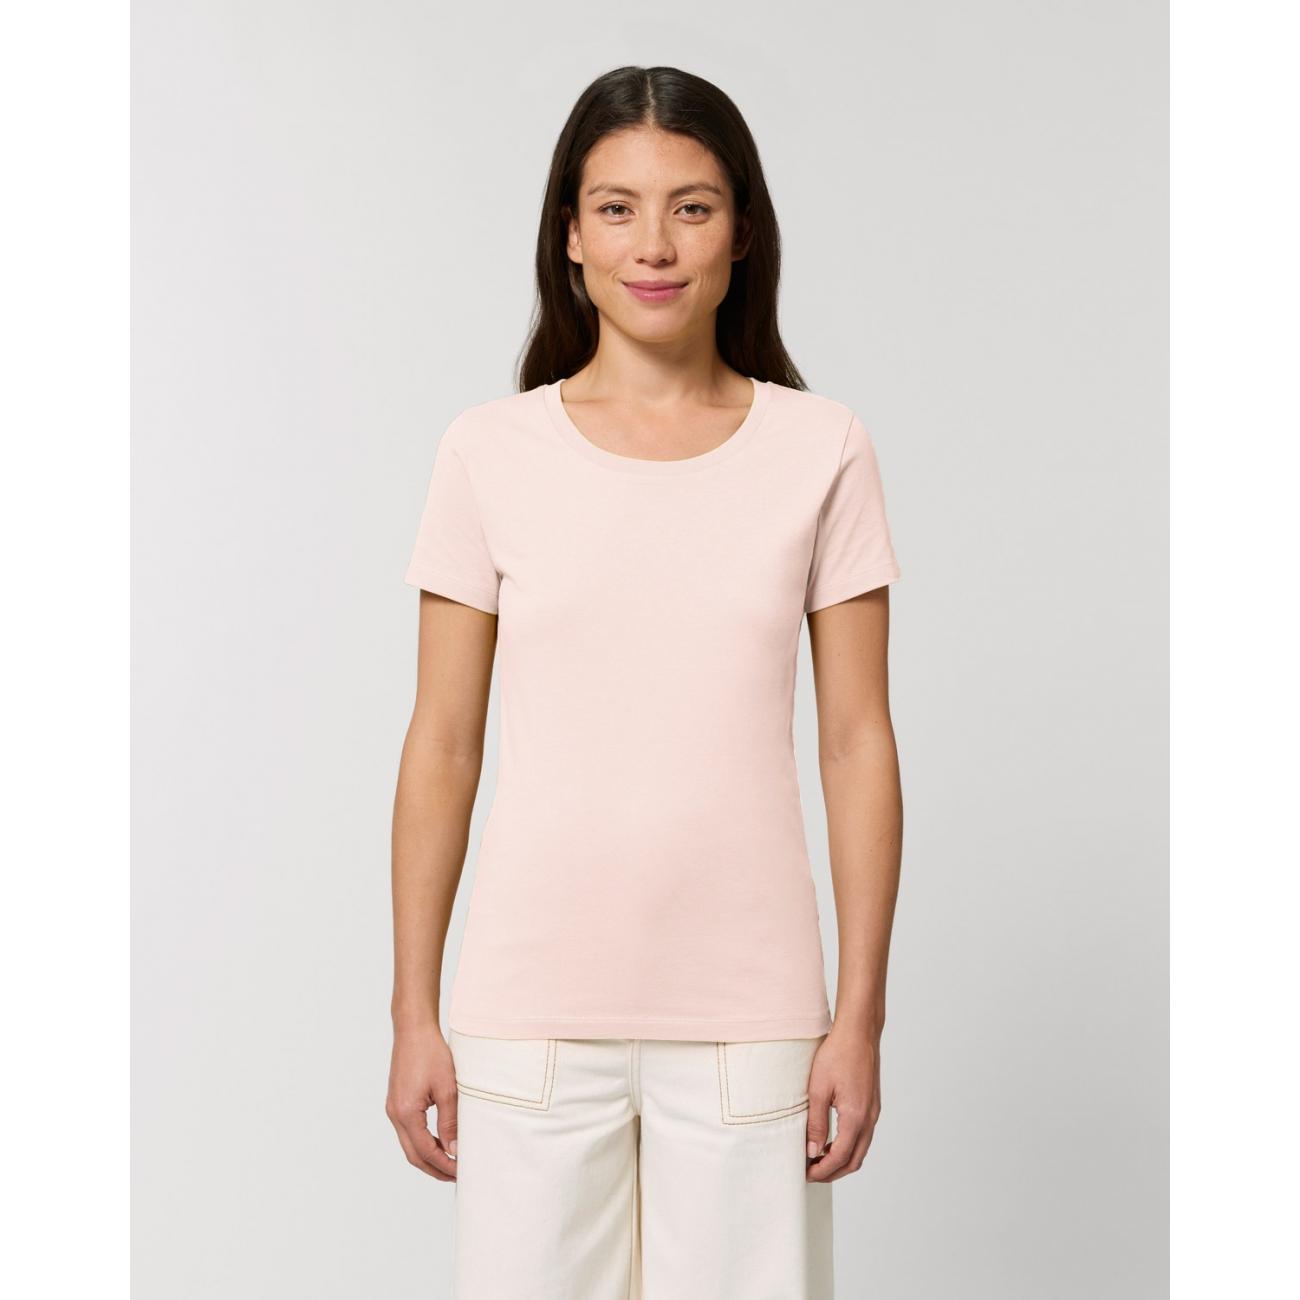 https://tee-shirt-bio.com/10453-thickbox_default/tee-shirt-femme-coton-bio-coupe-feminine-et-cintree-rose-layette.jpg